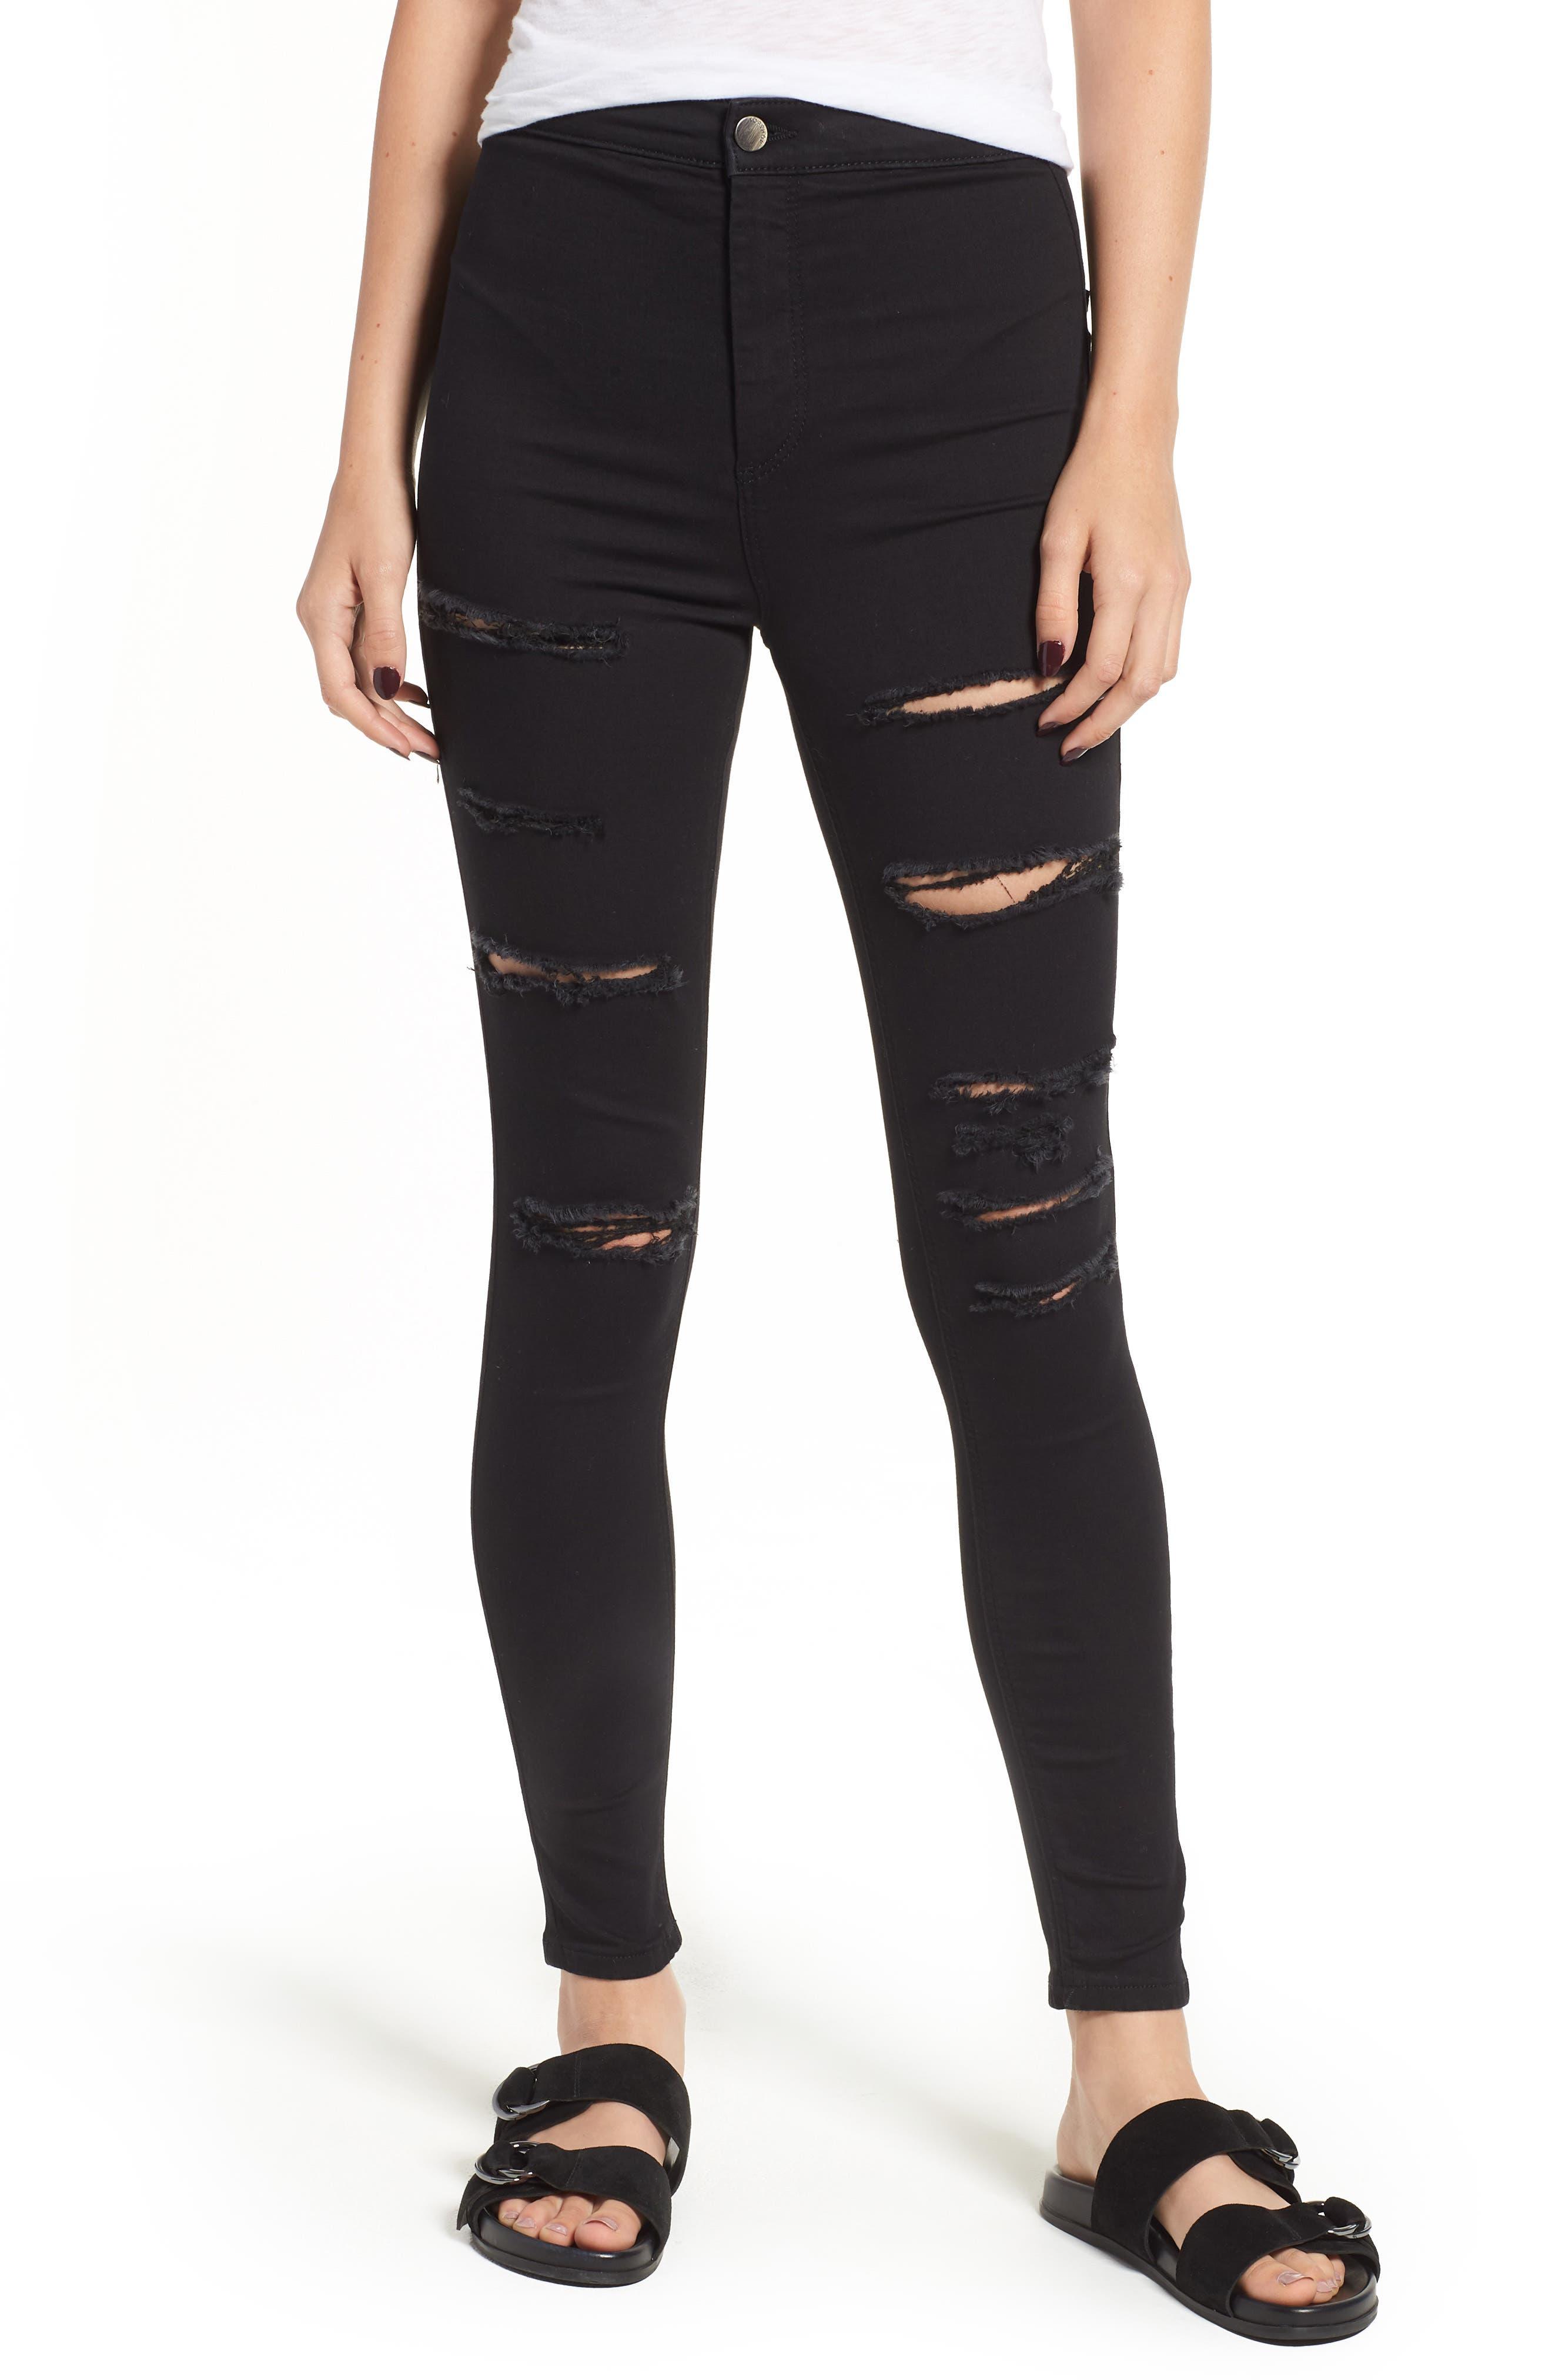 TOPSHOP MOTO Joni Ripped Skinny Jeans, Main, color, 001